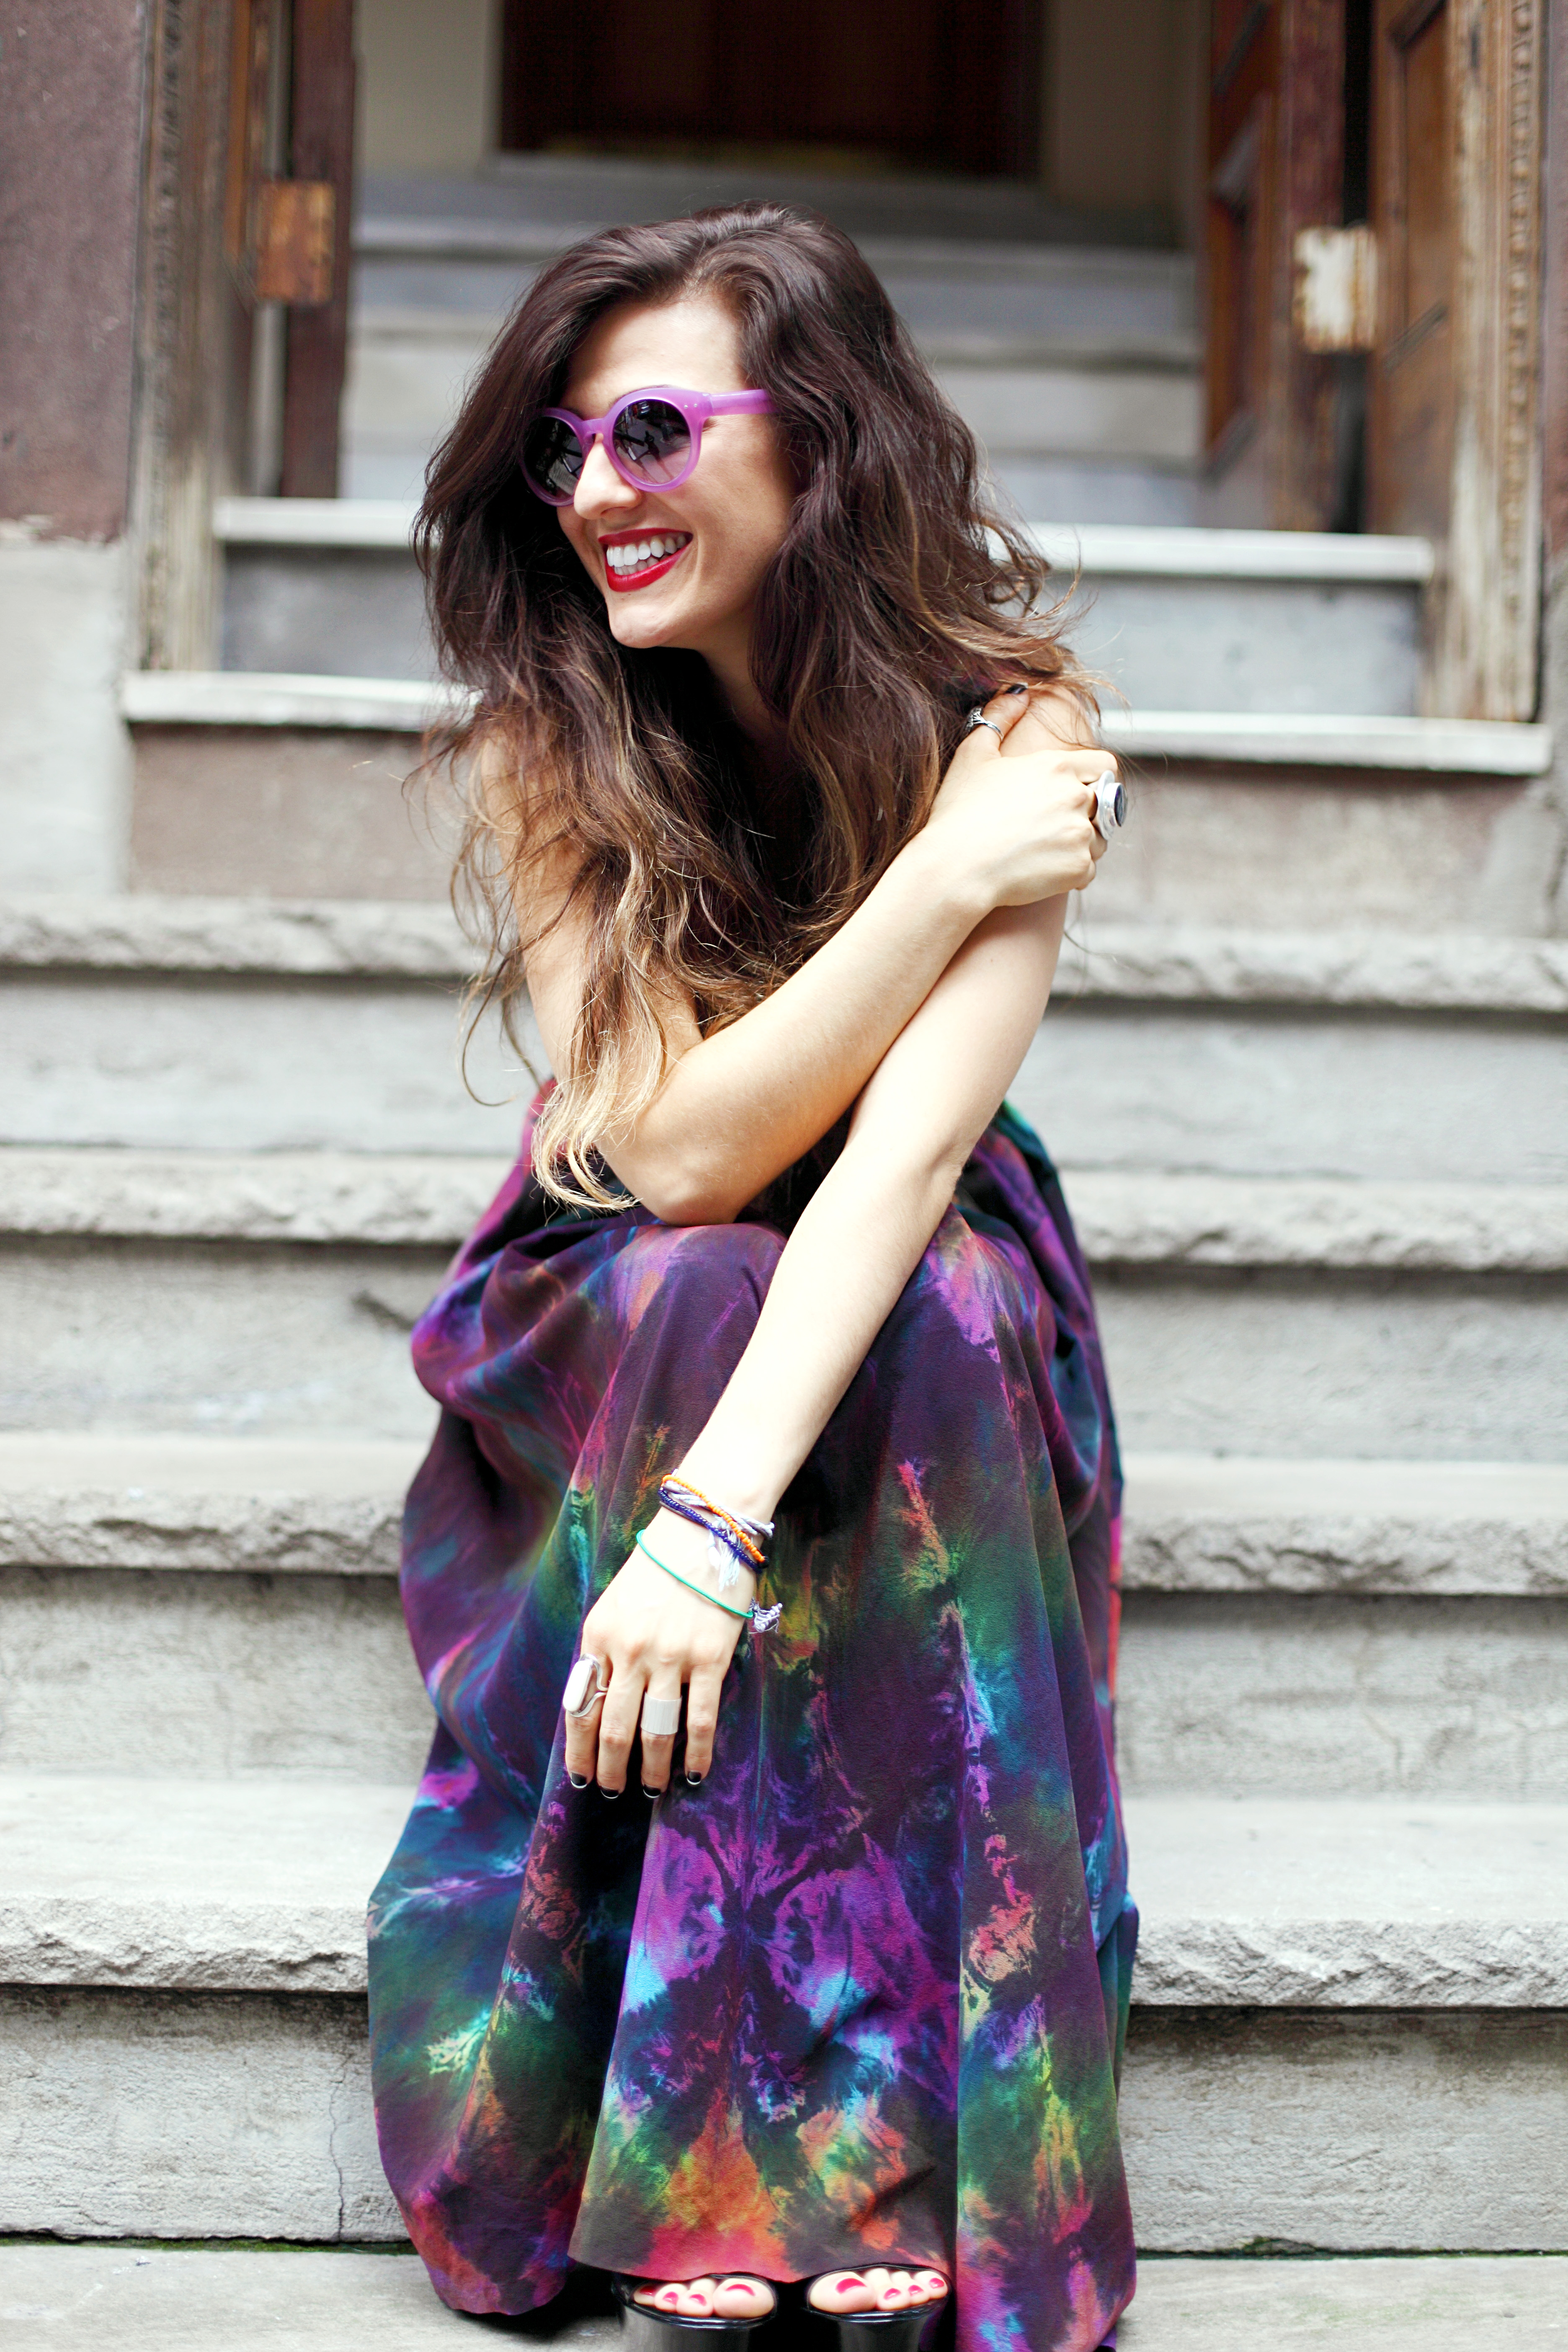 Madewell-Sunglasses-Blogger-Street-Style